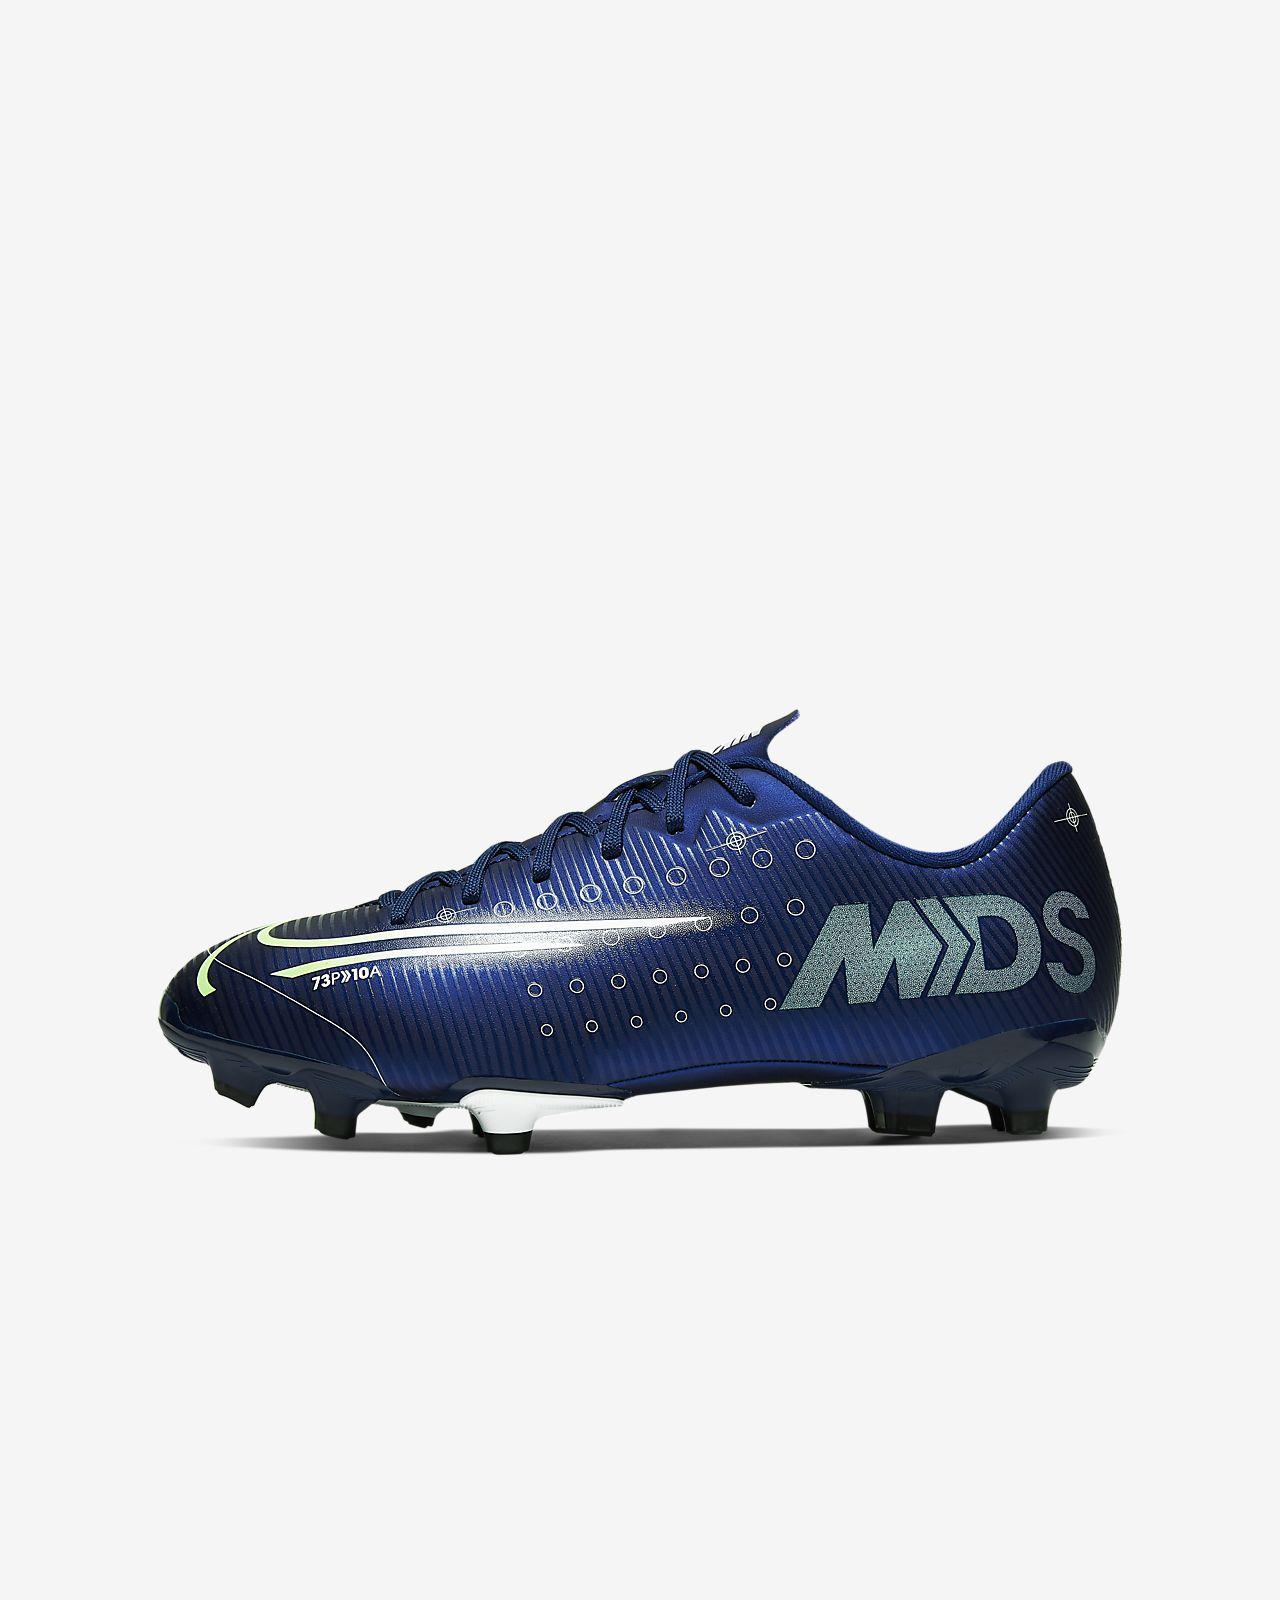 Nike Jr. Mercurial Vapor 13 Academy MDS MG Botas de fútbol para múltiples superficies - Niño/a y niño/a pequeño/a